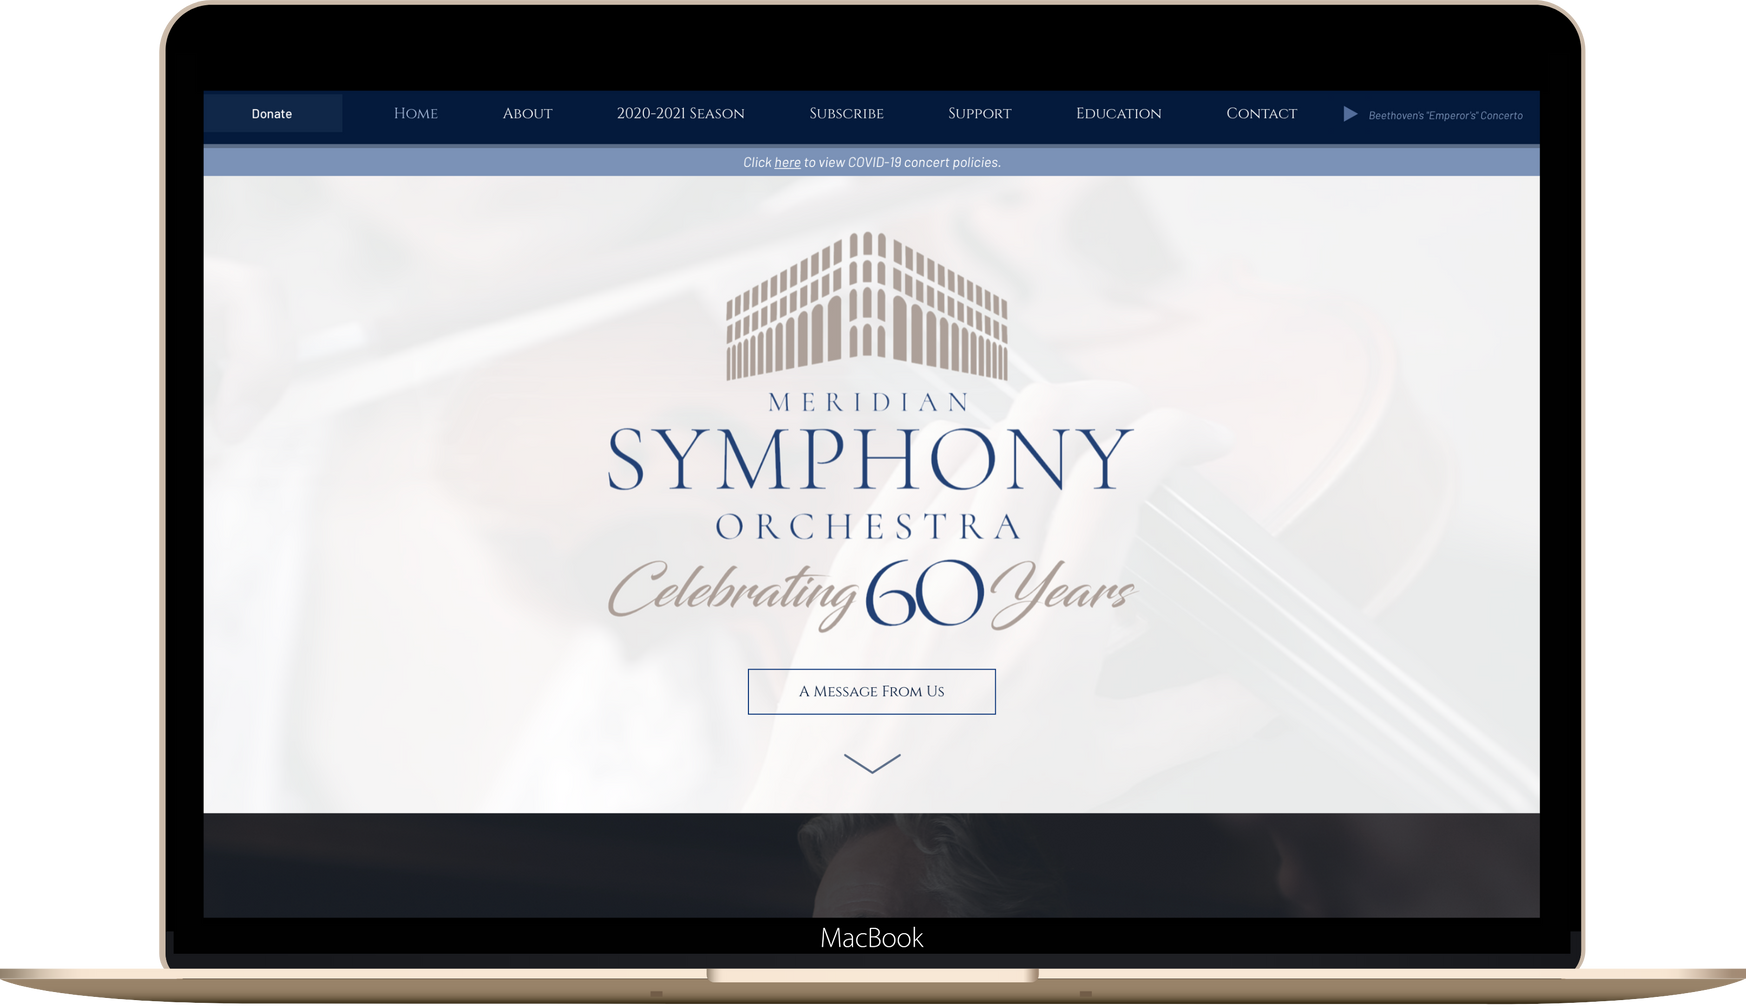 Meridian Symphony Orchestra